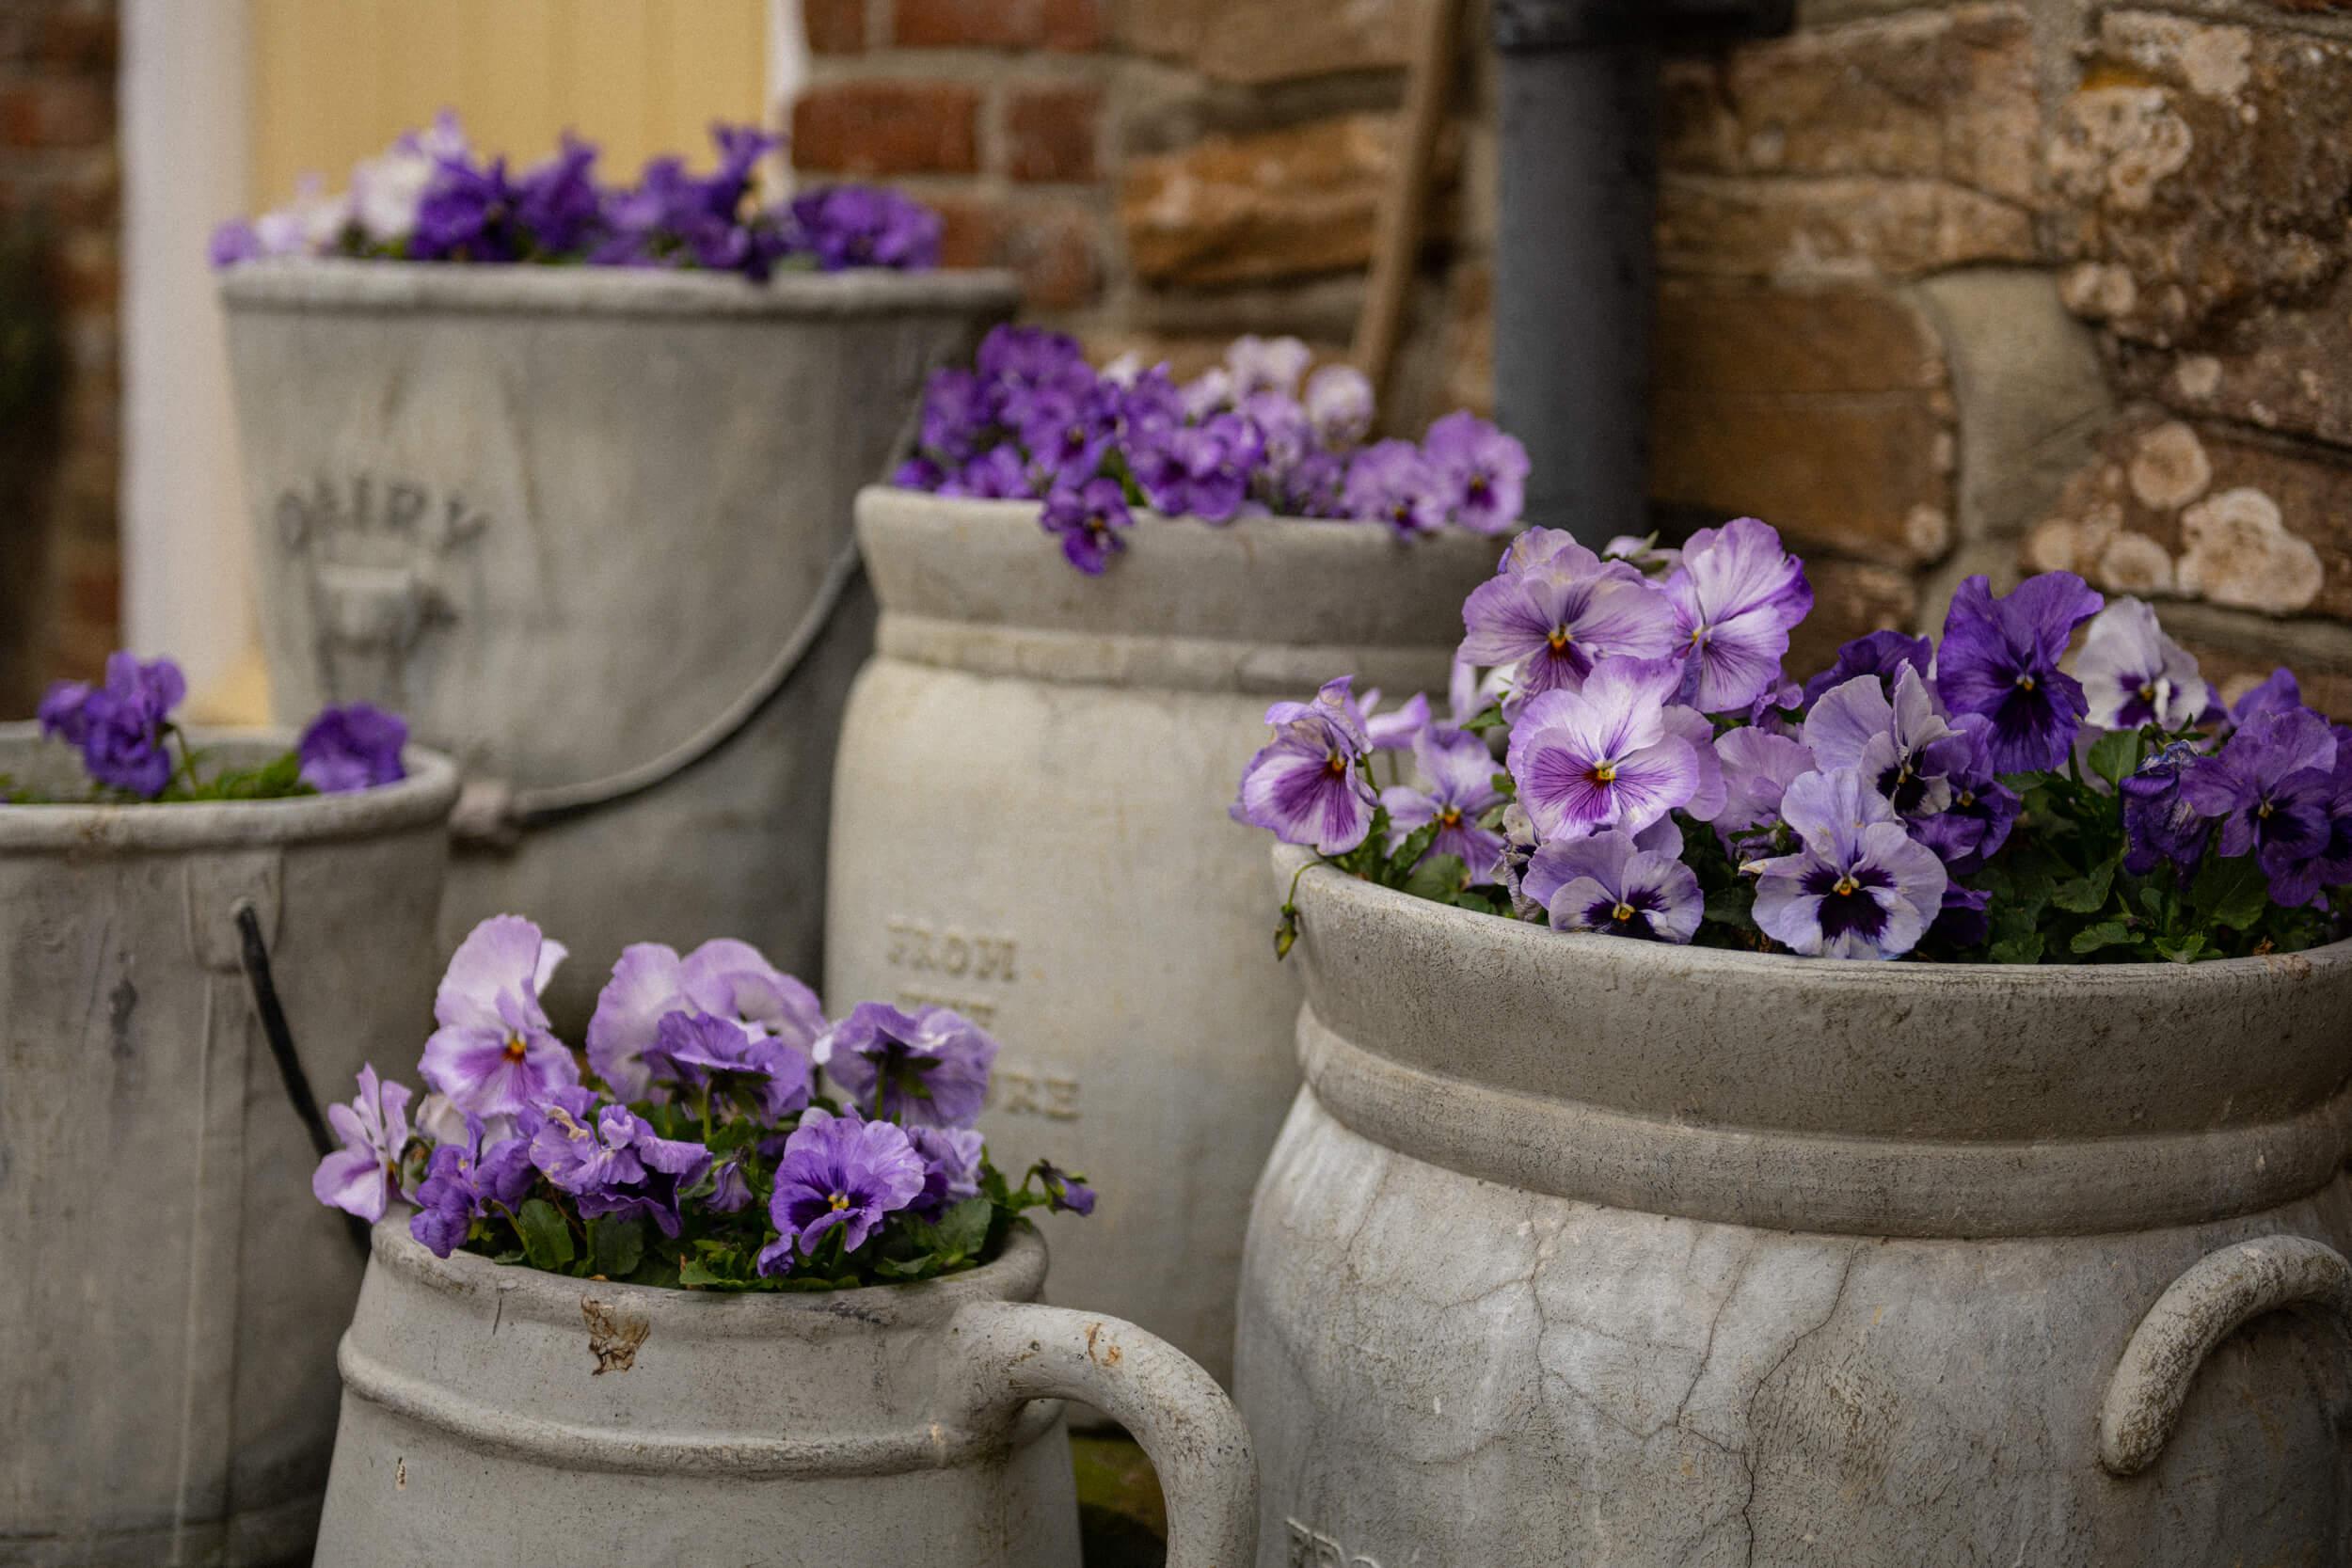 Flowers in old milk urns